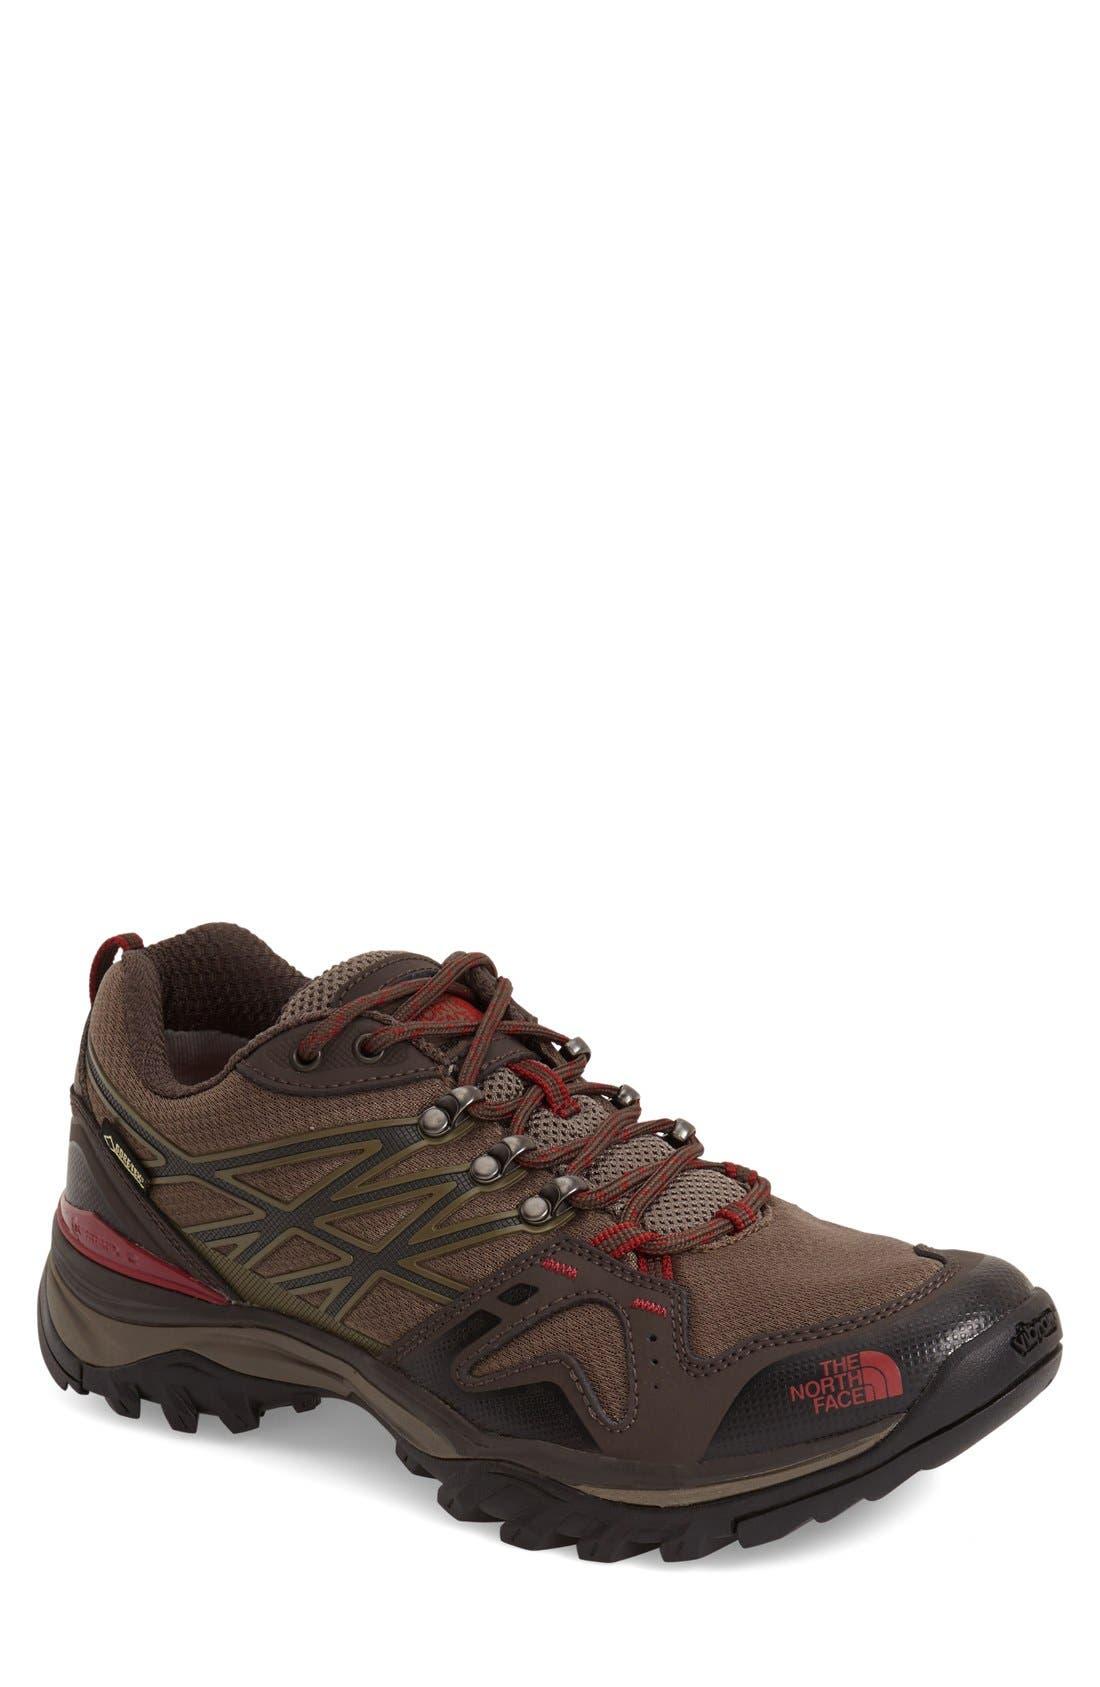 'Hedgehog Fastpack' Gore-Tex<sup>®</sup> Waterproof Hiking Shoe,                             Main thumbnail 2, color,